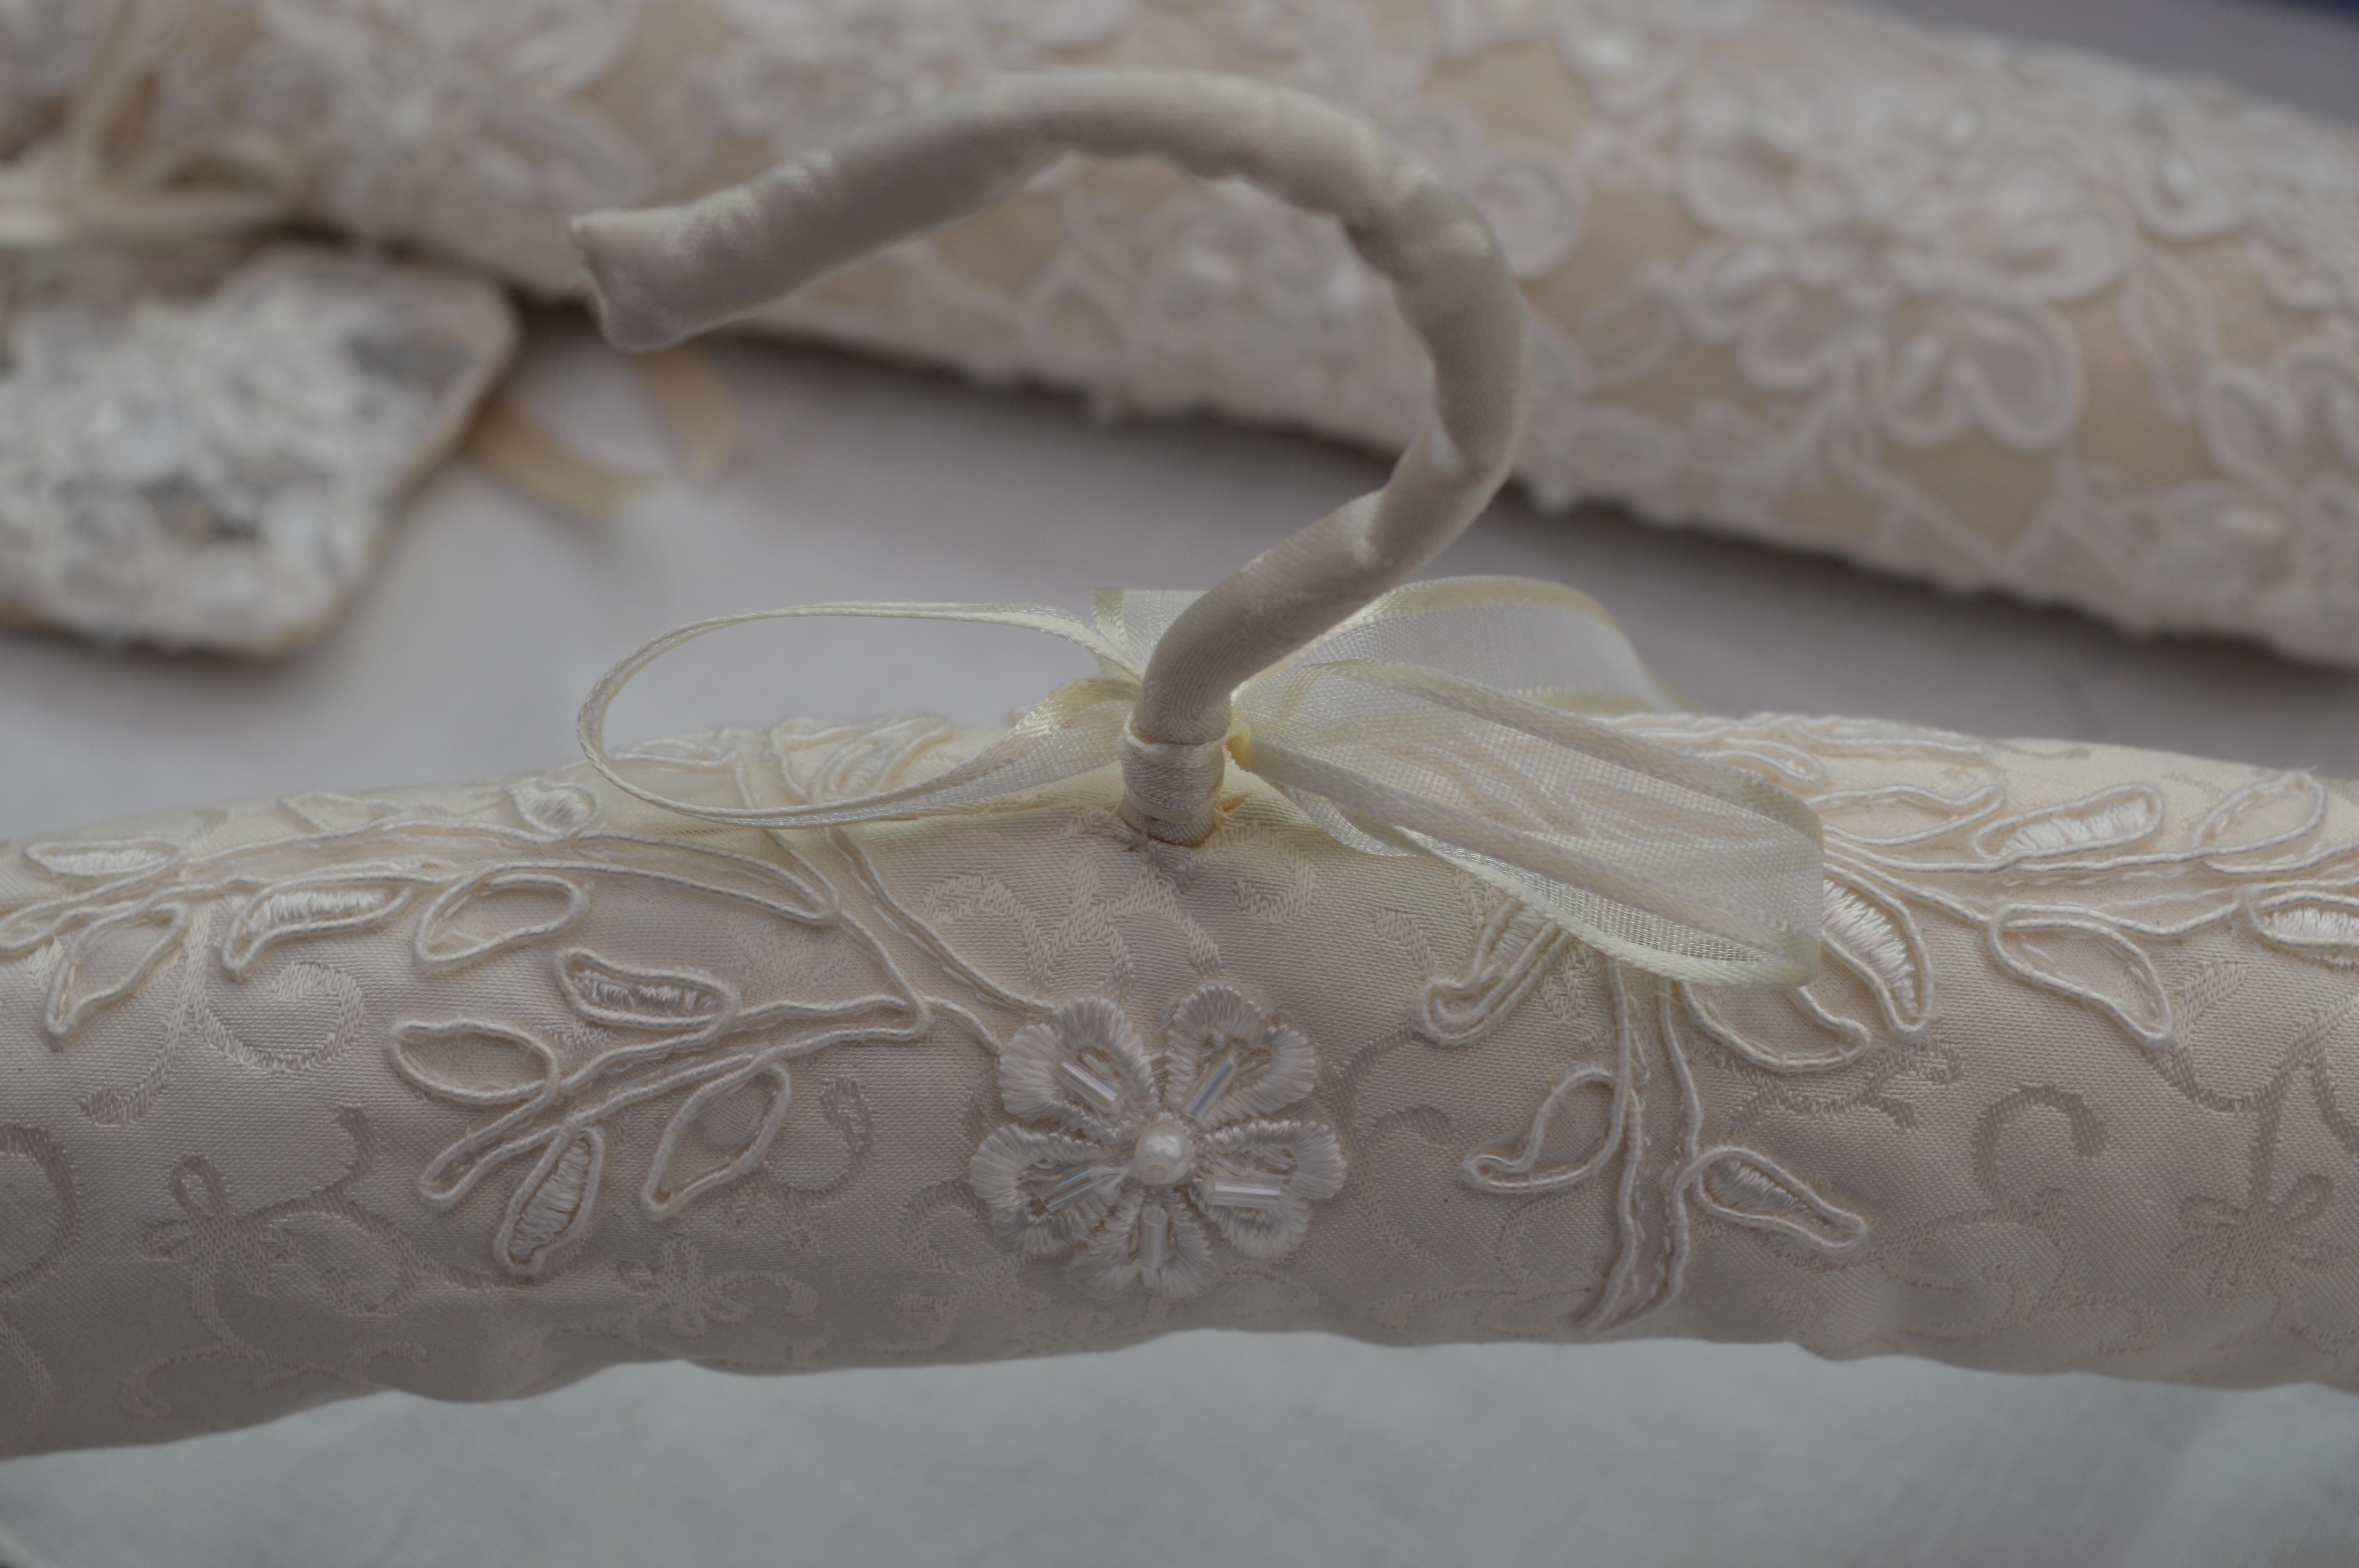 Padded coat-hangers